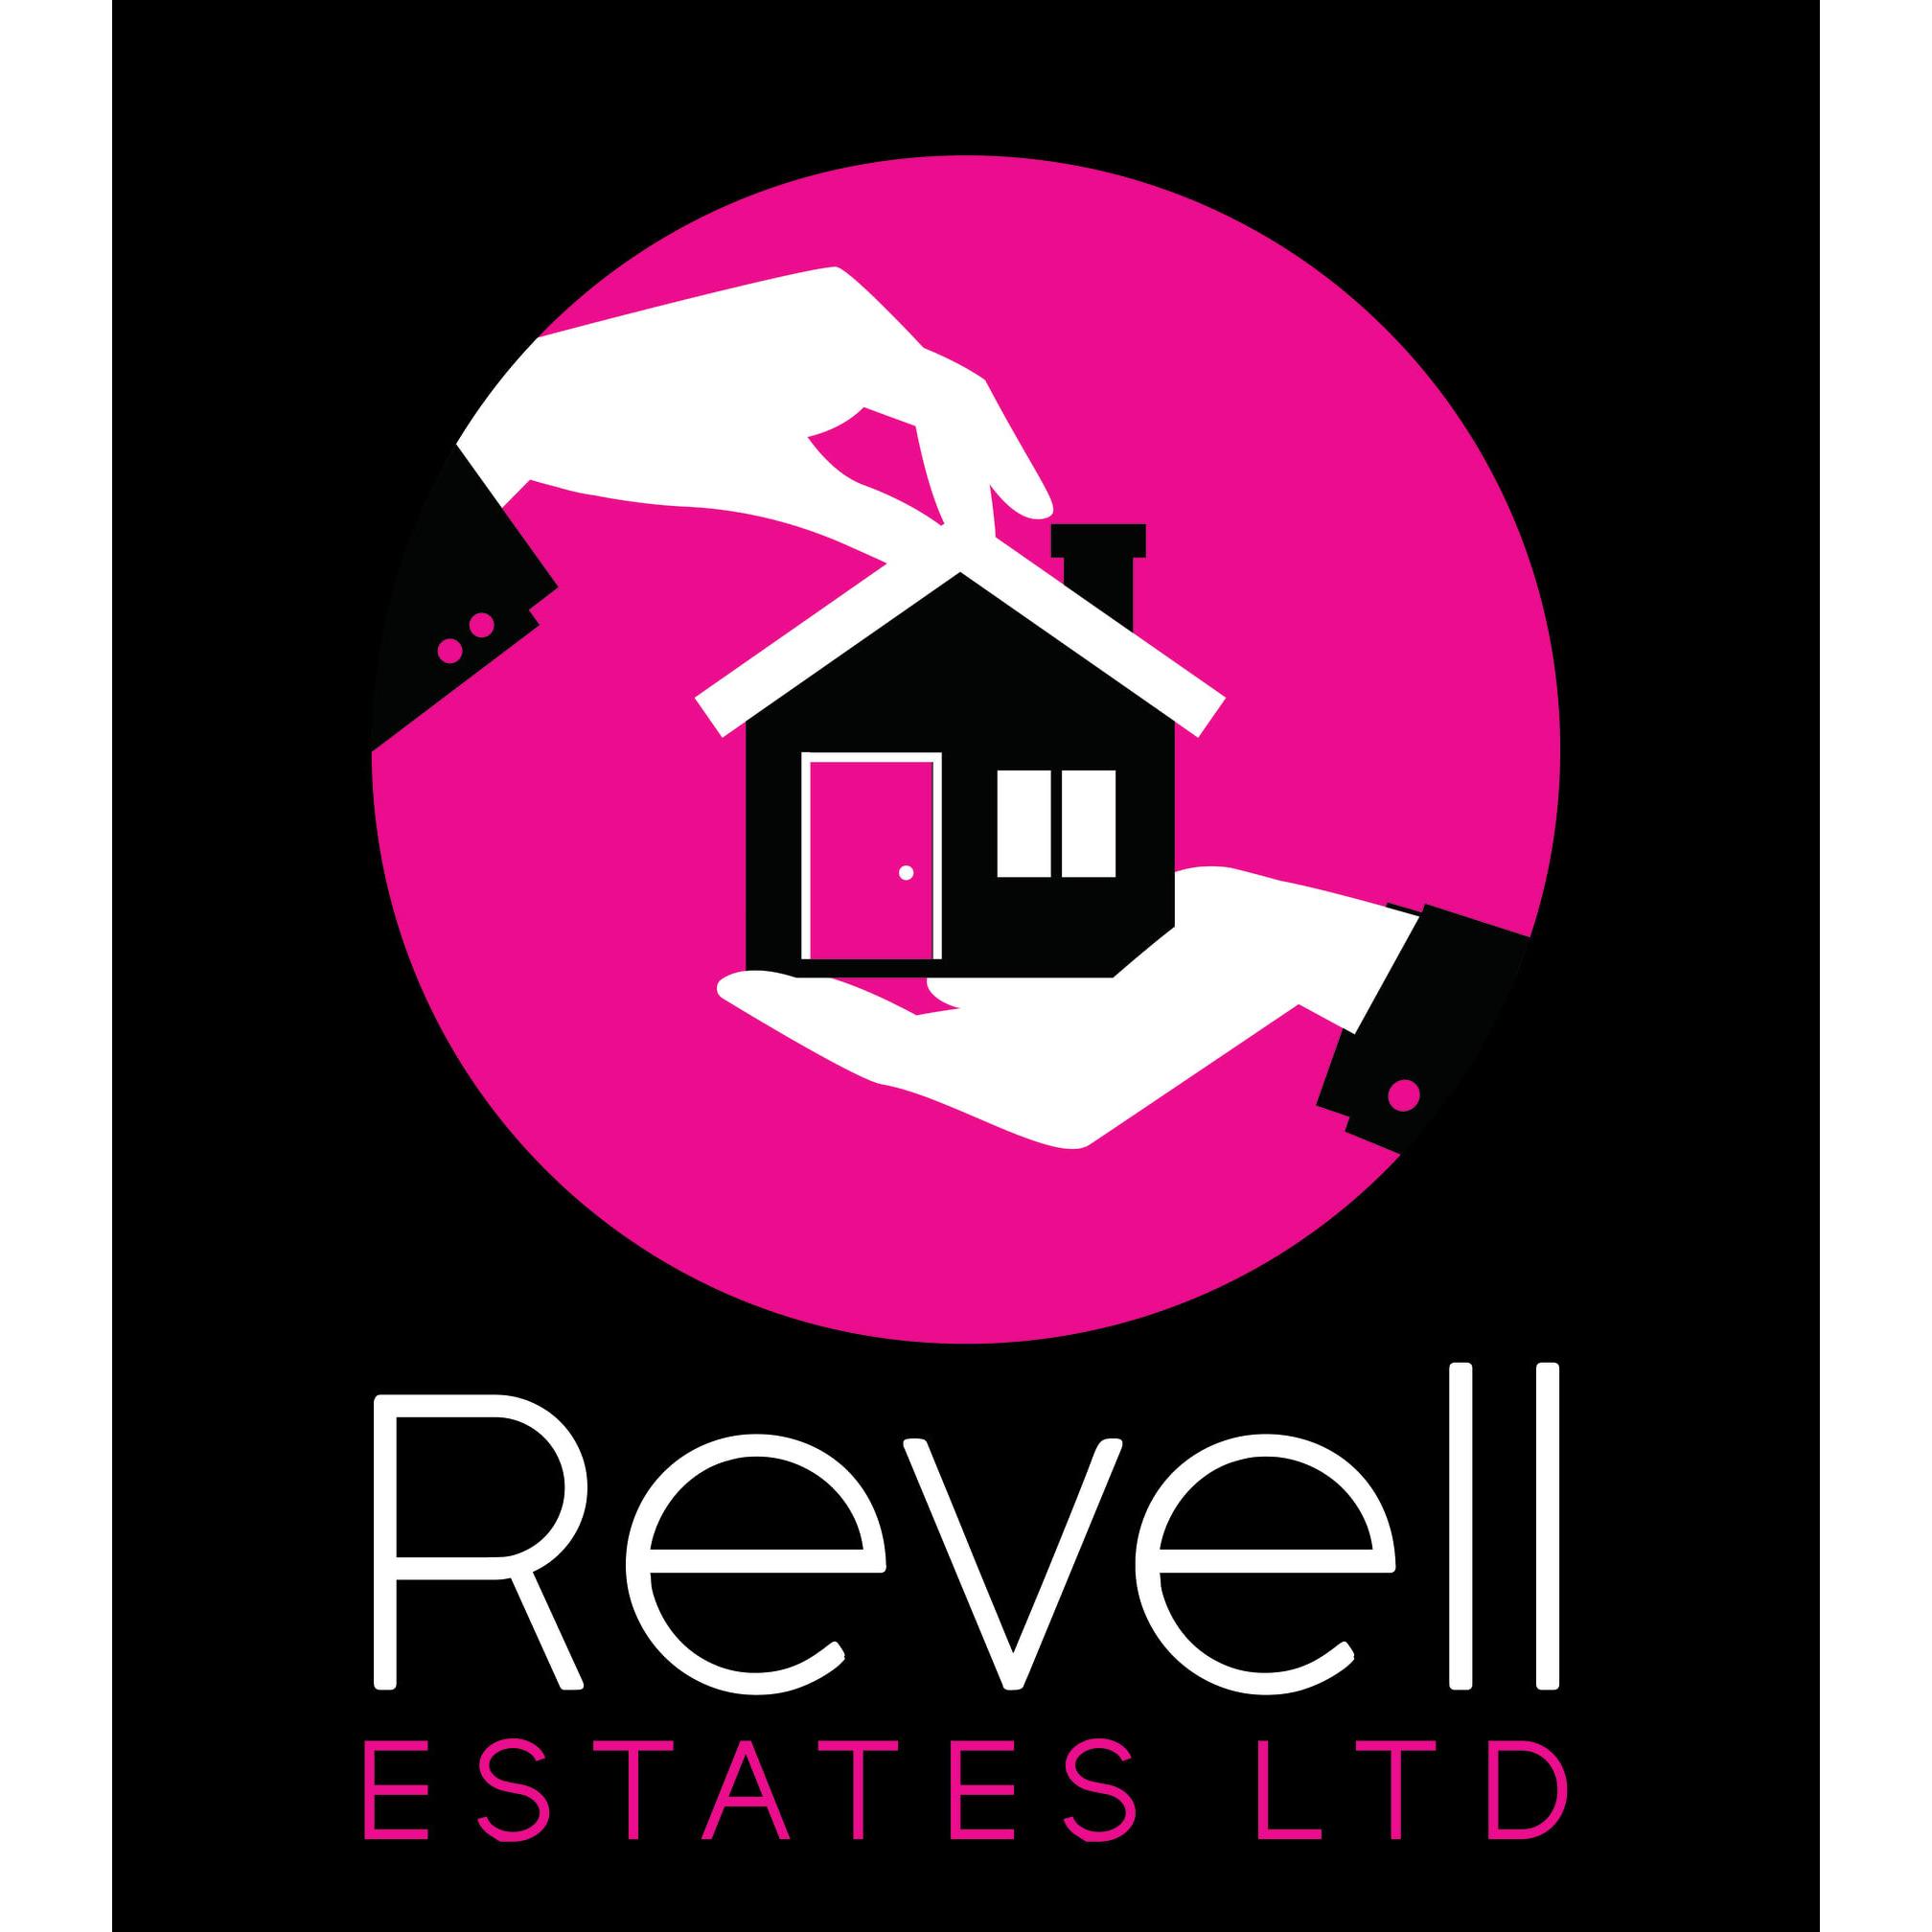 Revell Estates Ltd - Colchester, Essex CO2 8WJ - 01206 984646 | ShowMeLocal.com